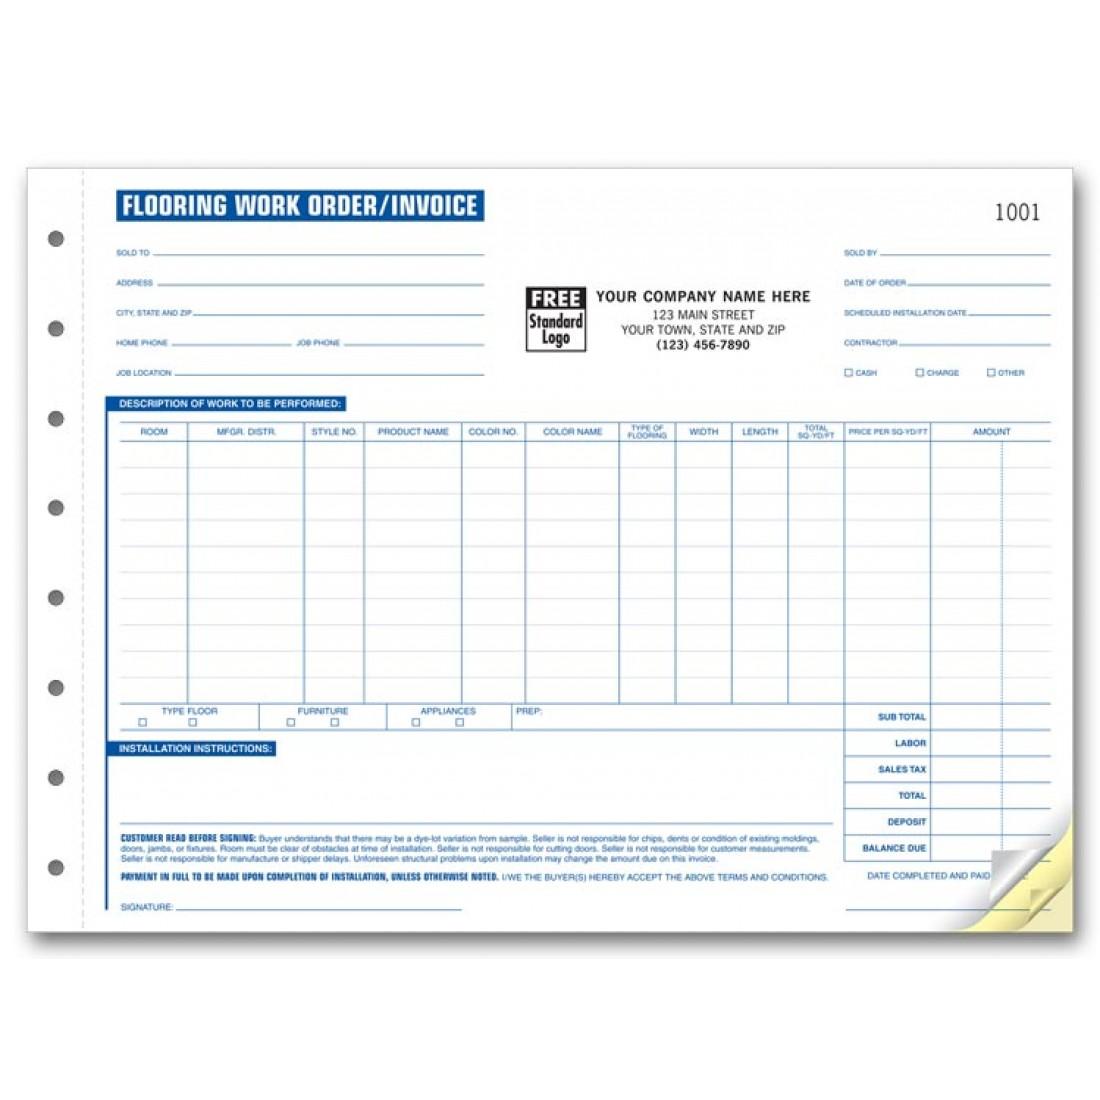 Flooring Work Order Forms